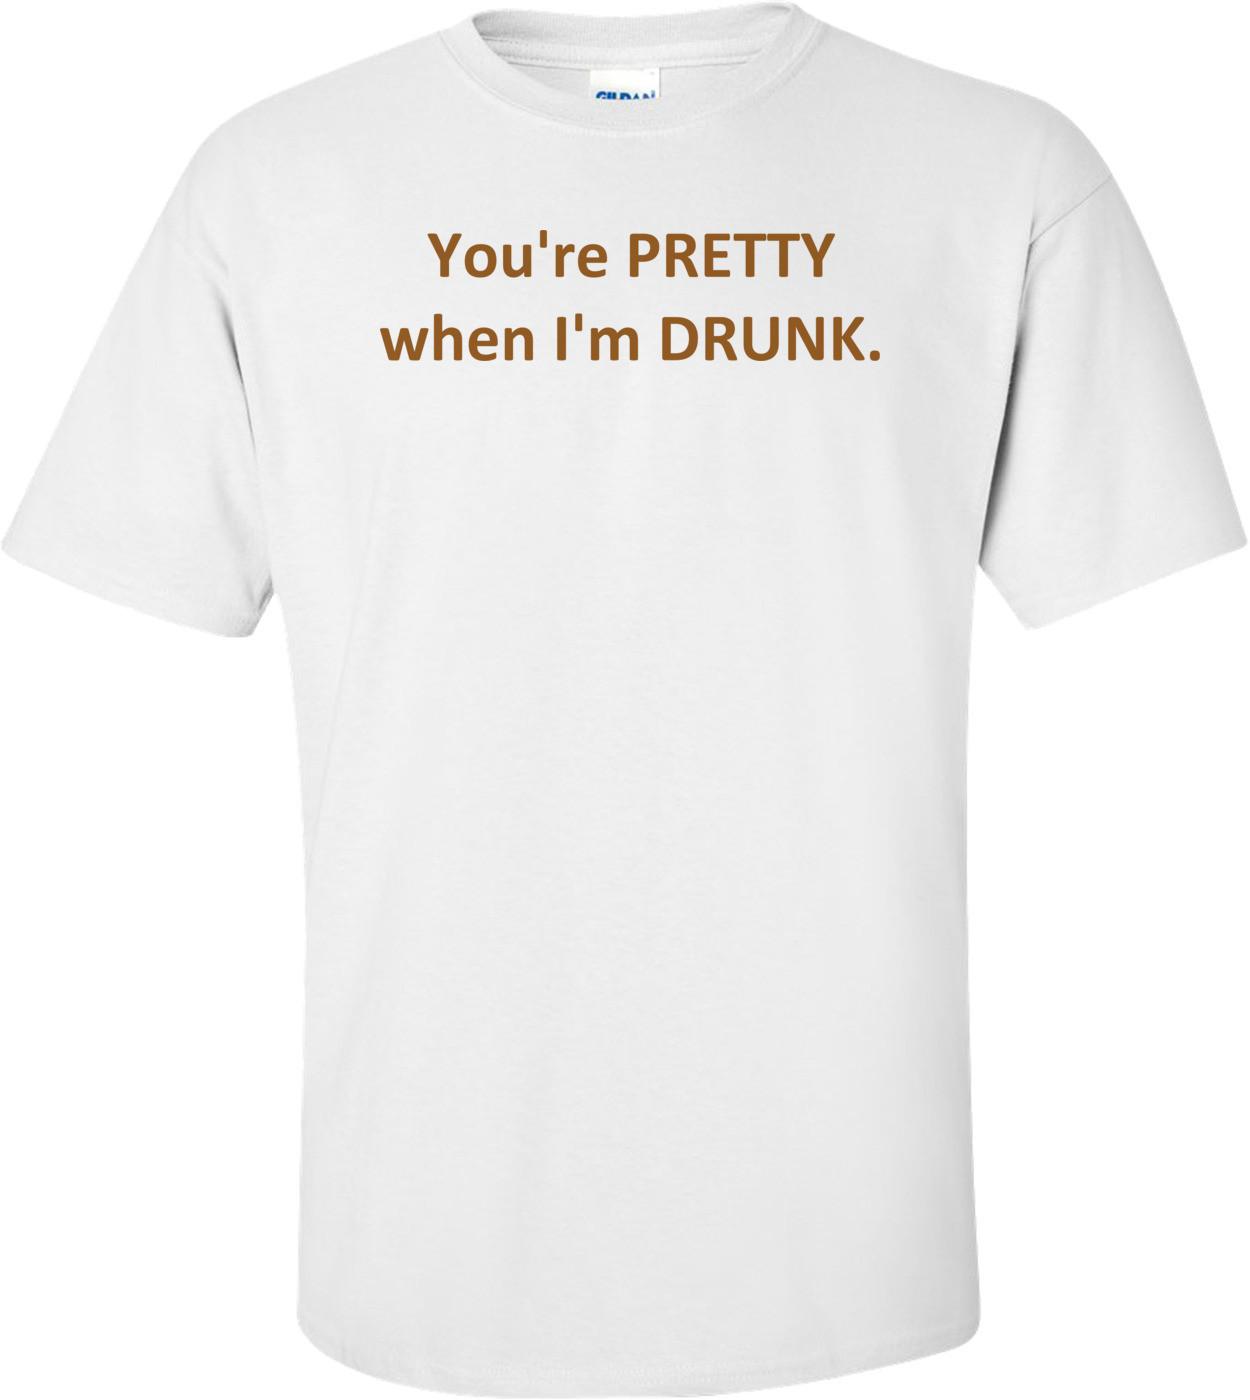 You're PRETTY when I'm DRUNK. Shirt